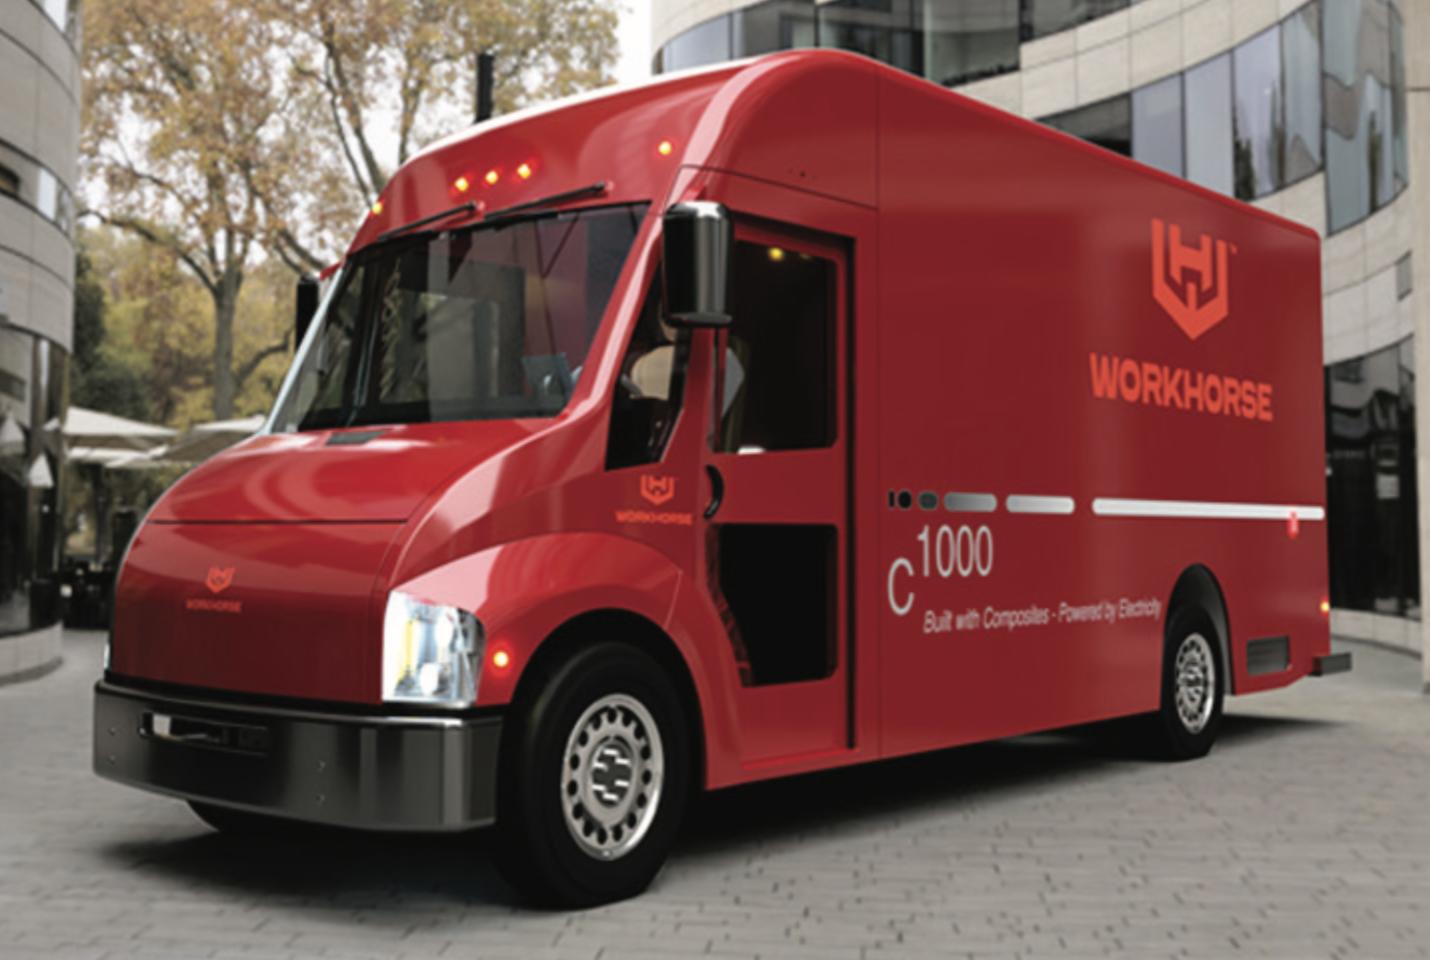 Workhorse red electric van